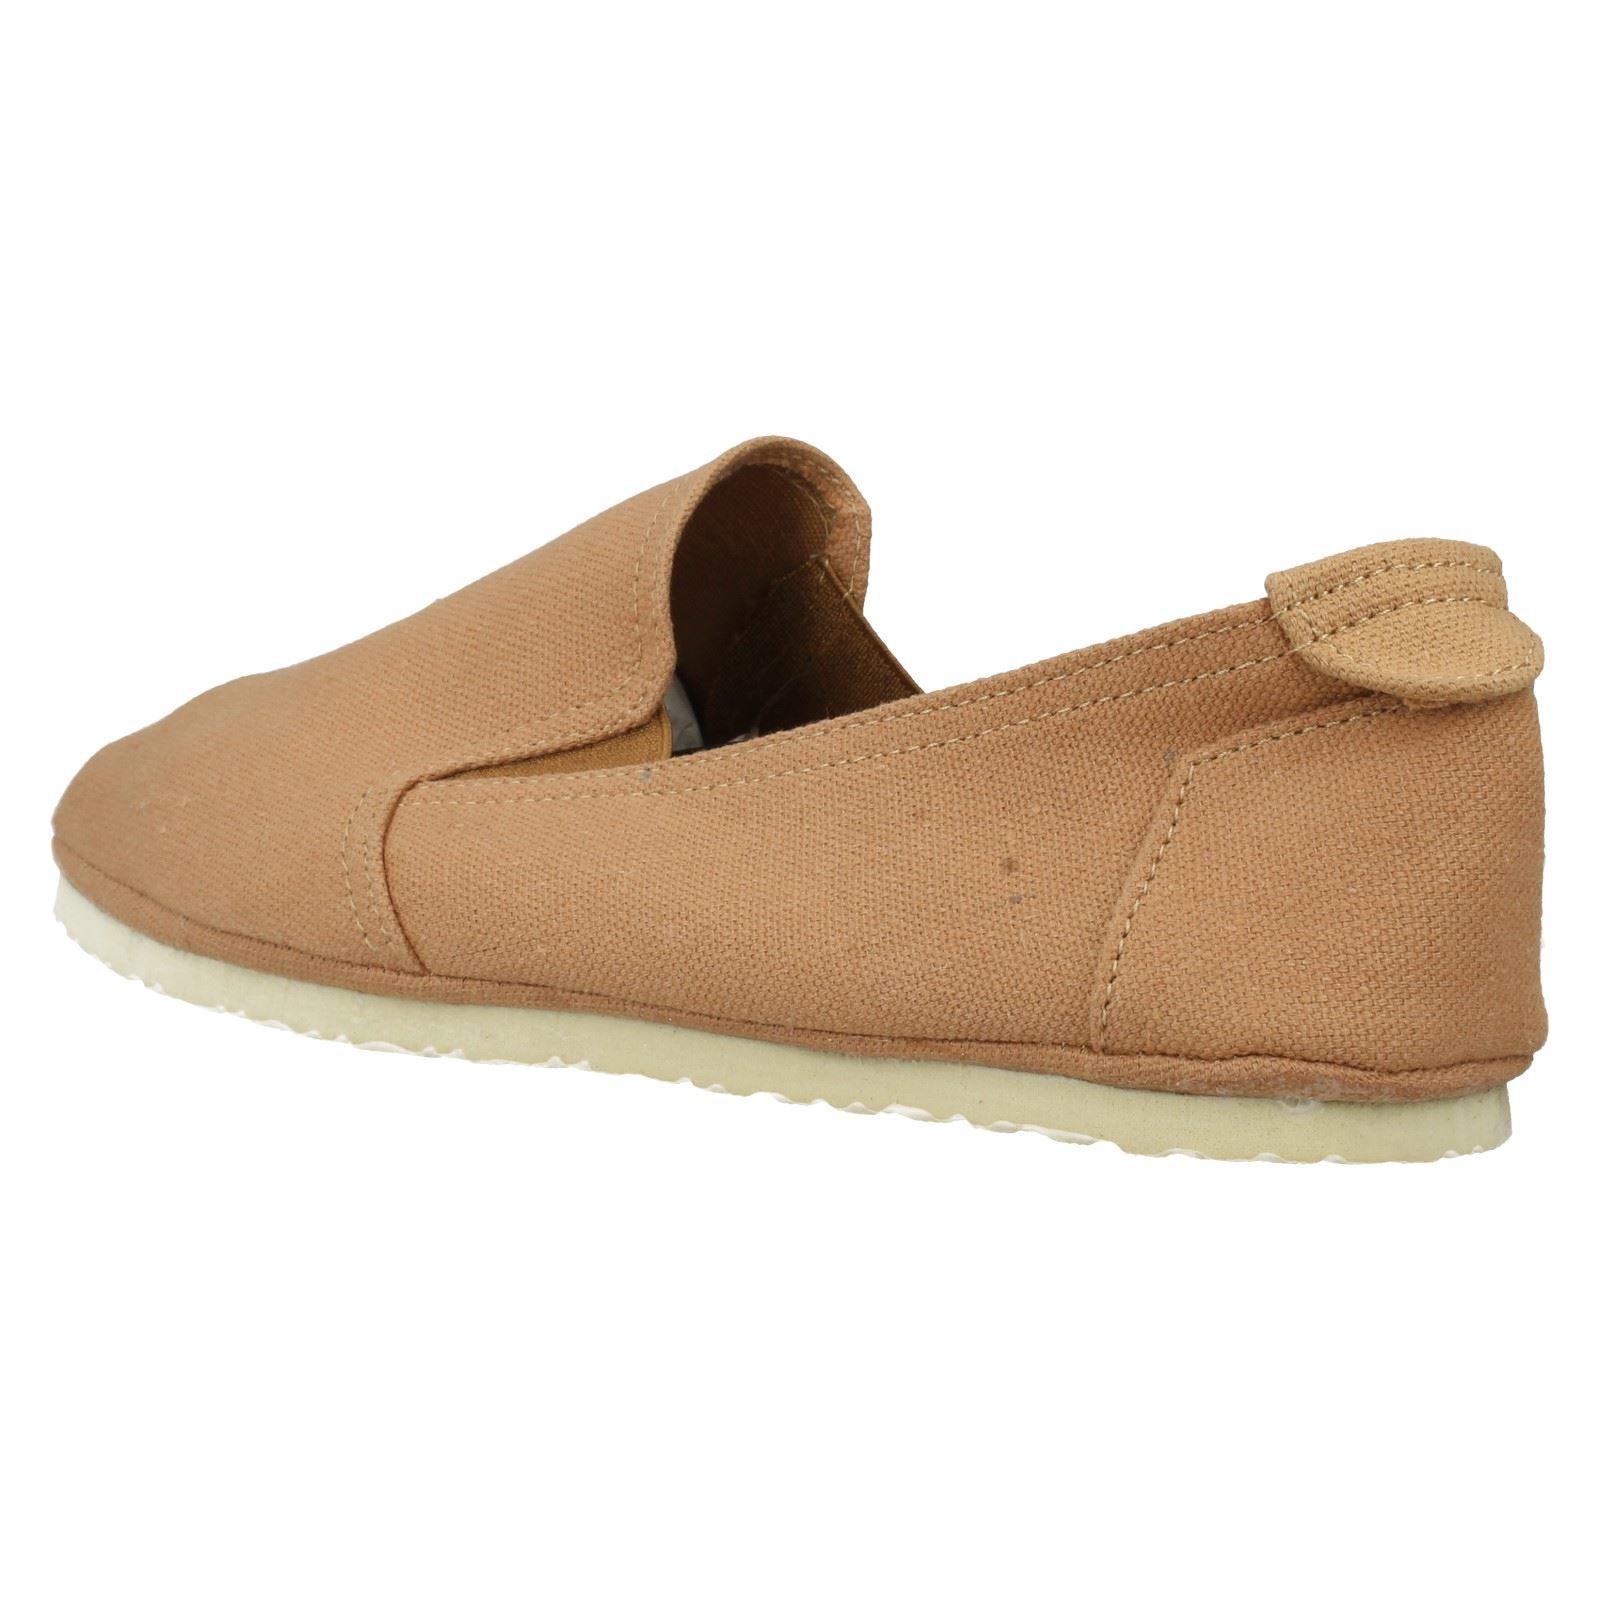 Para Hombre Spot On Informales Zapatos de lona A1080